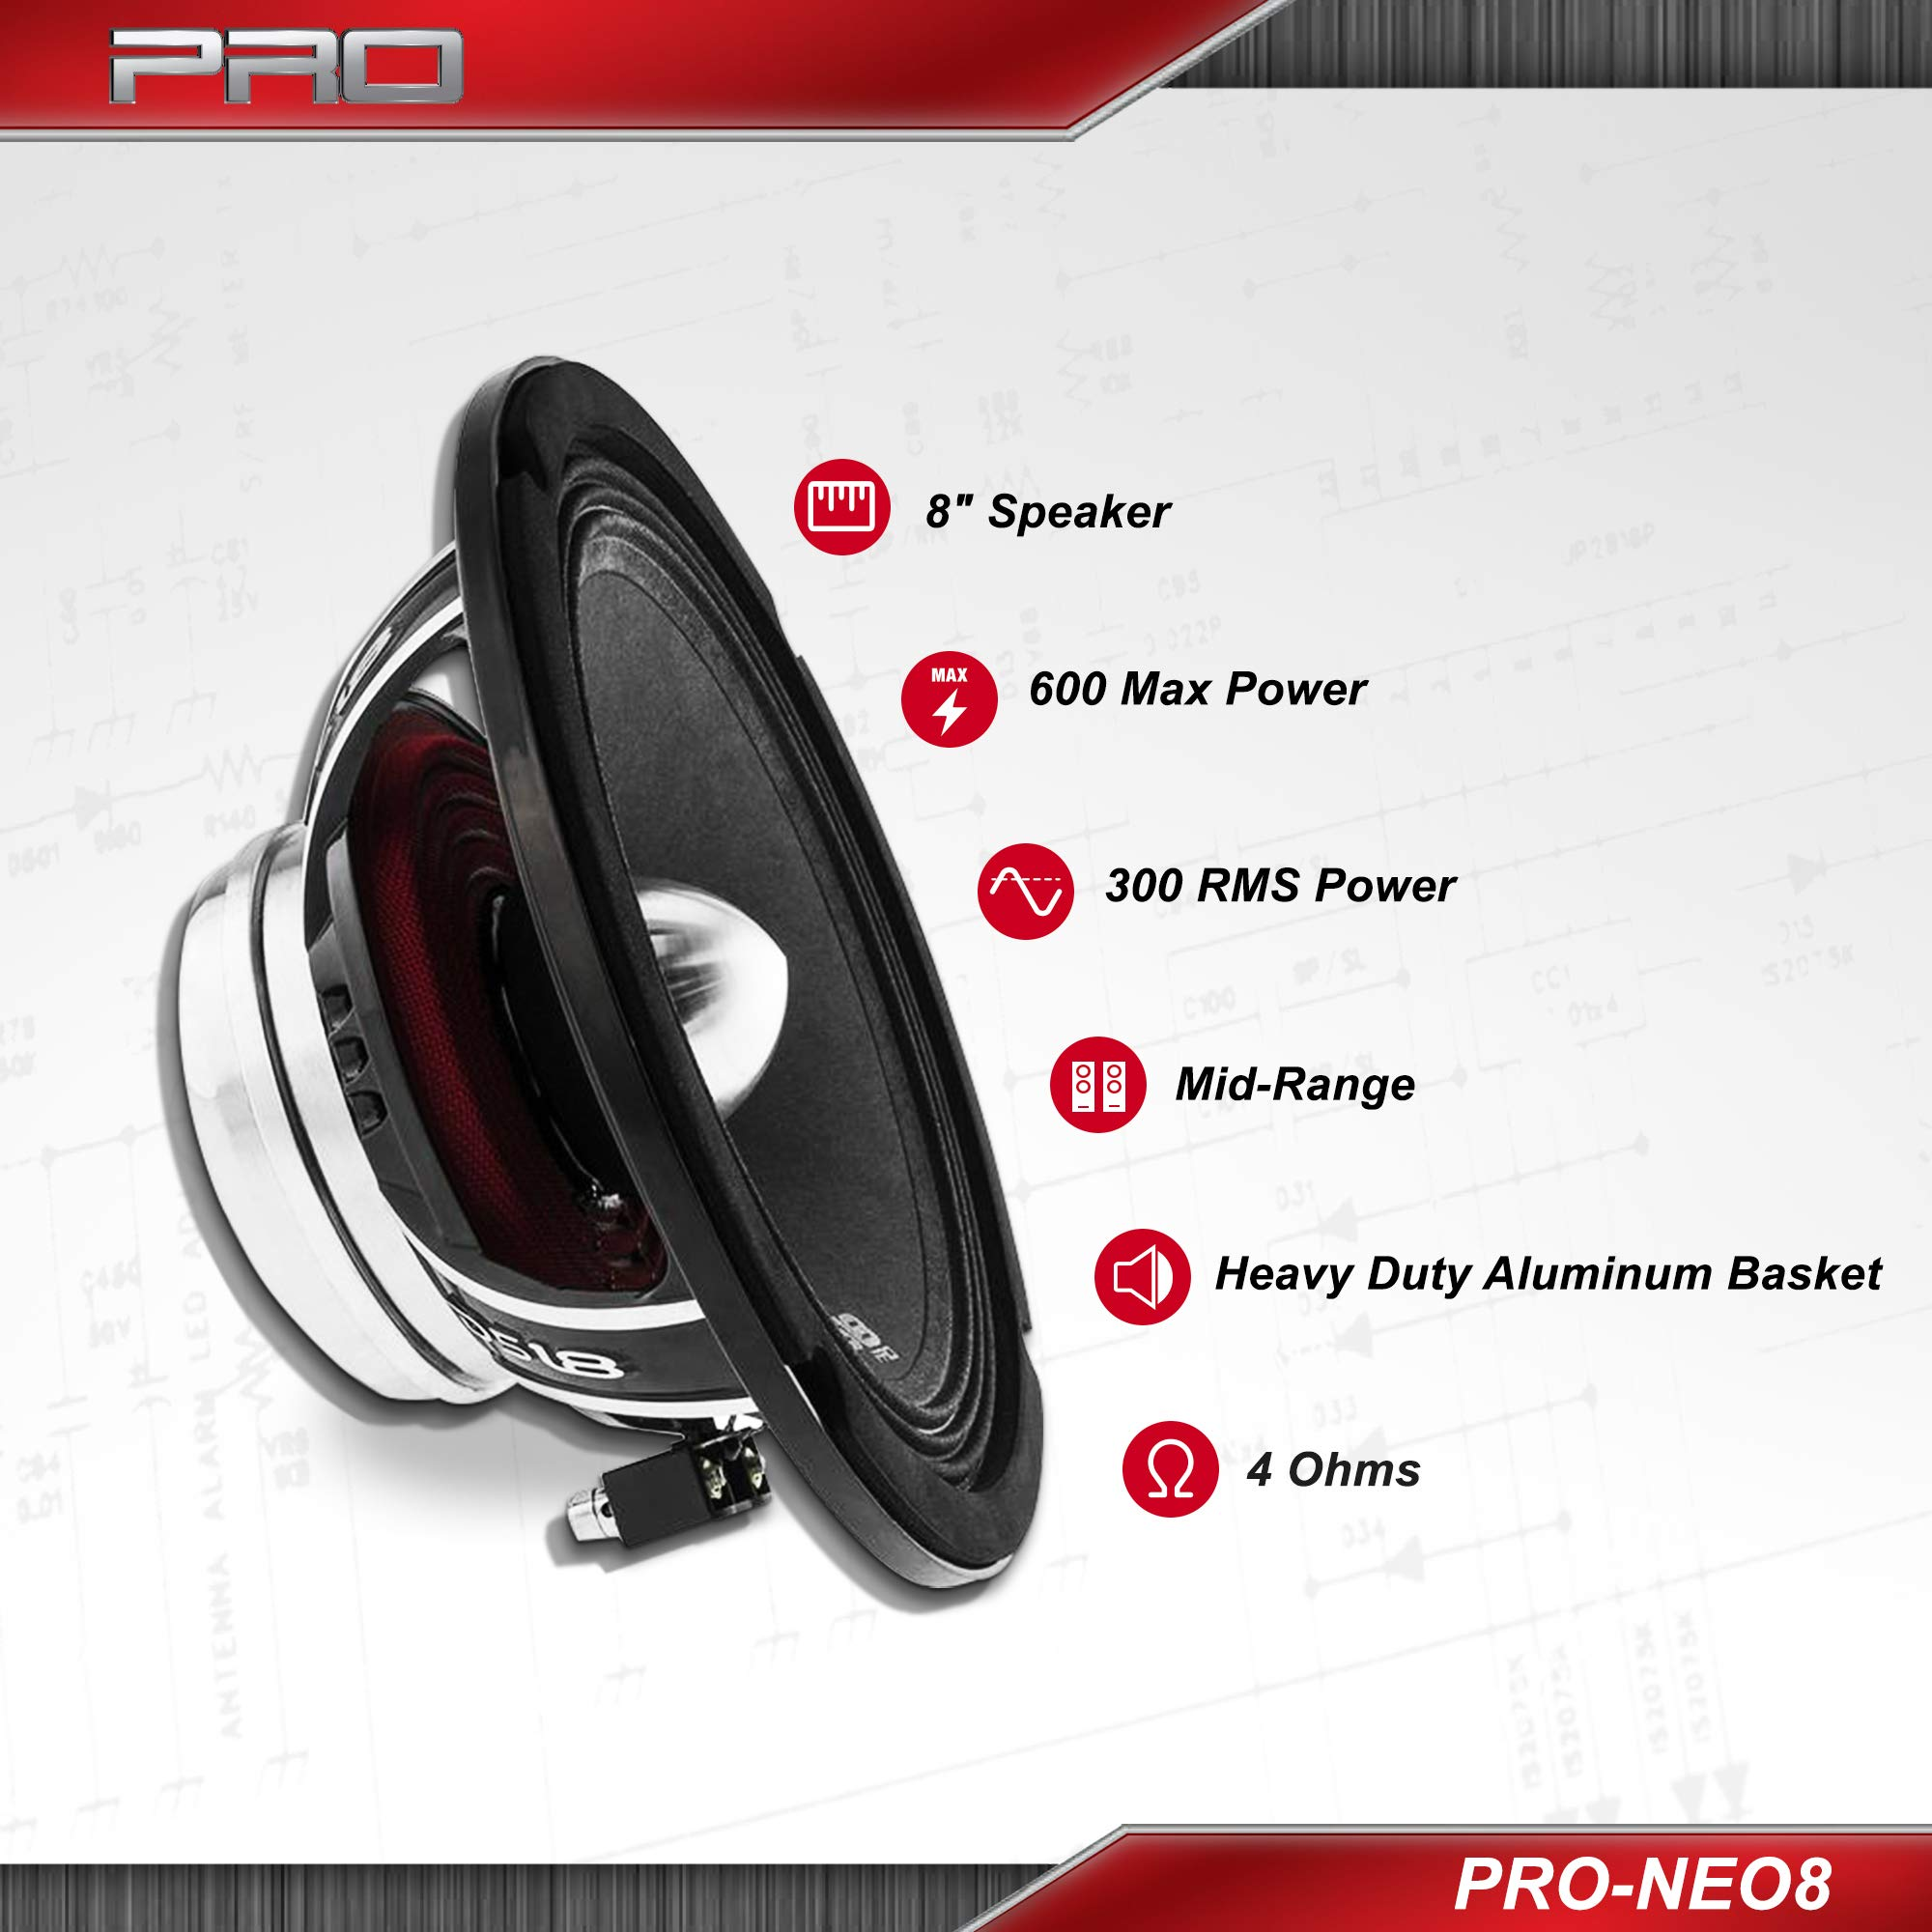 DS18 PRO-NEO8 Loudspeaker - 8'', Midrange, Heavy Duty Aluminum Basket, 600W Max, 300W RMS, 4 Ohms, Neodymium Magnet - The Most Elegant Neodymium Full Range Loudspeakers Available